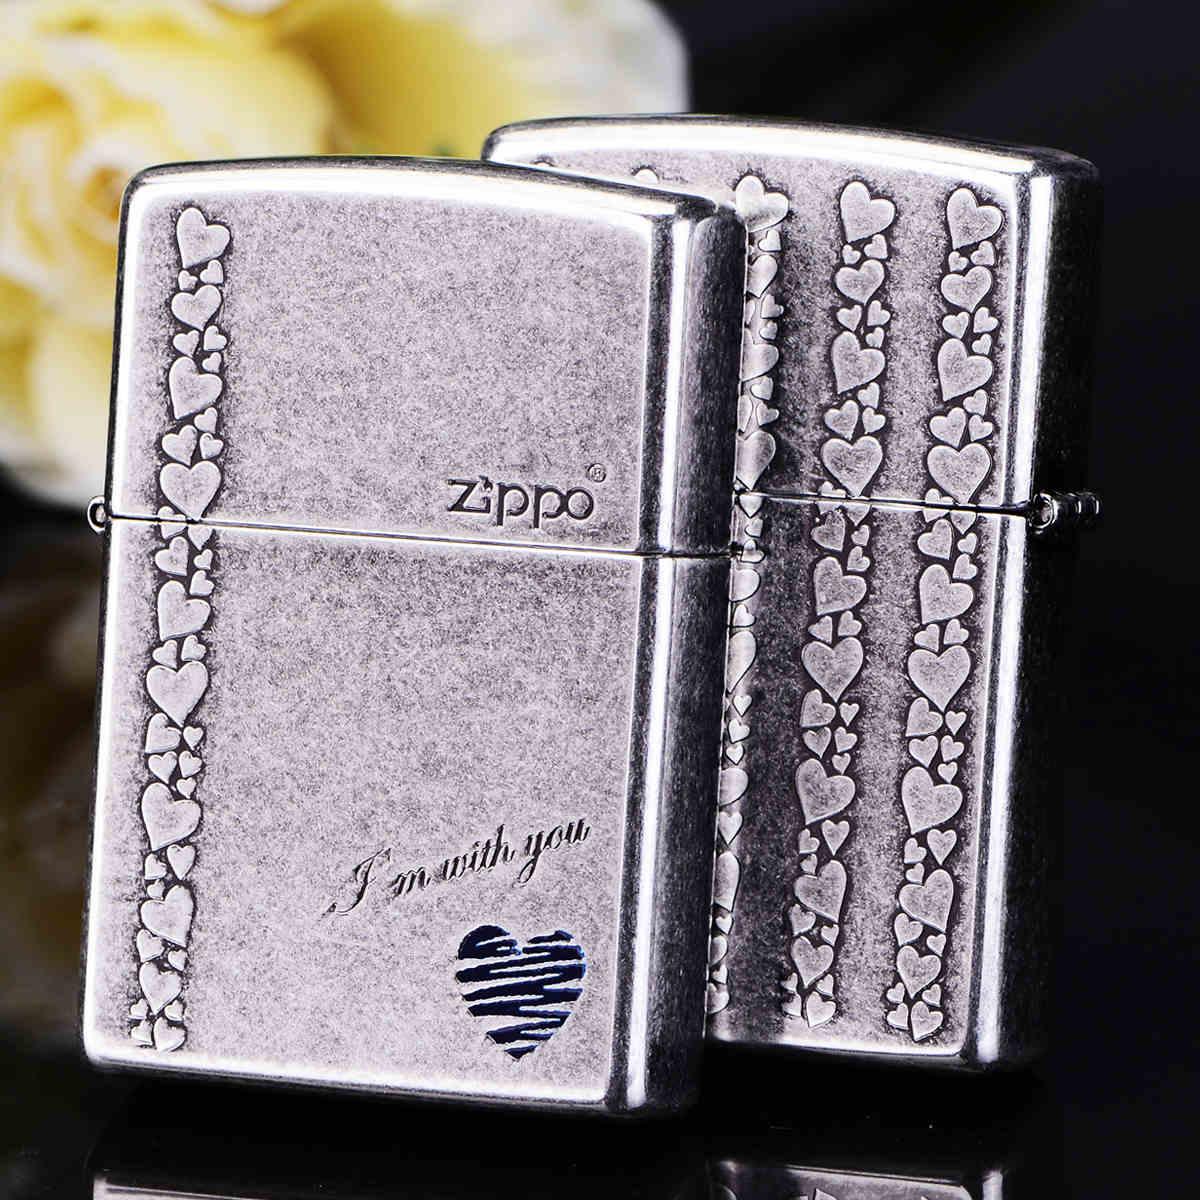 Buy Limited counter genuine original classic zippo lighters zippo ...